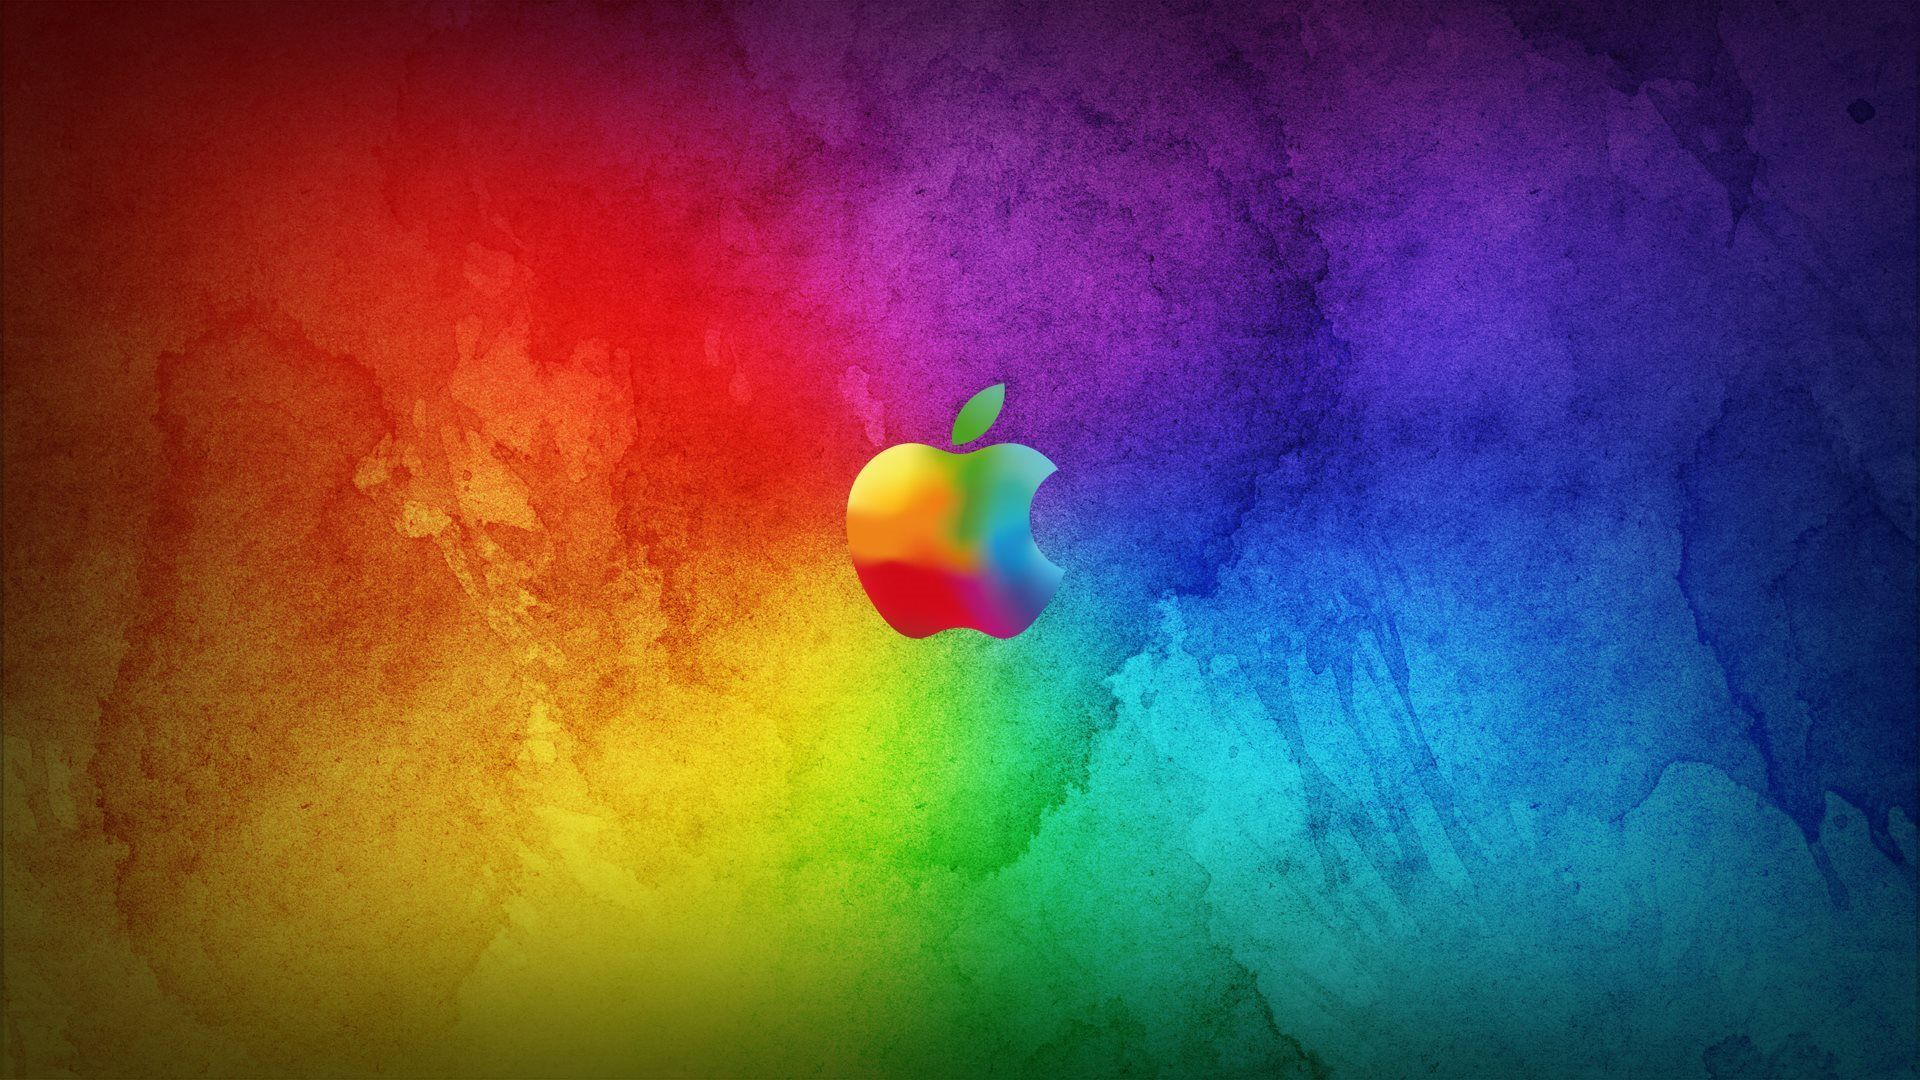 cool apple logo wallpaper #13